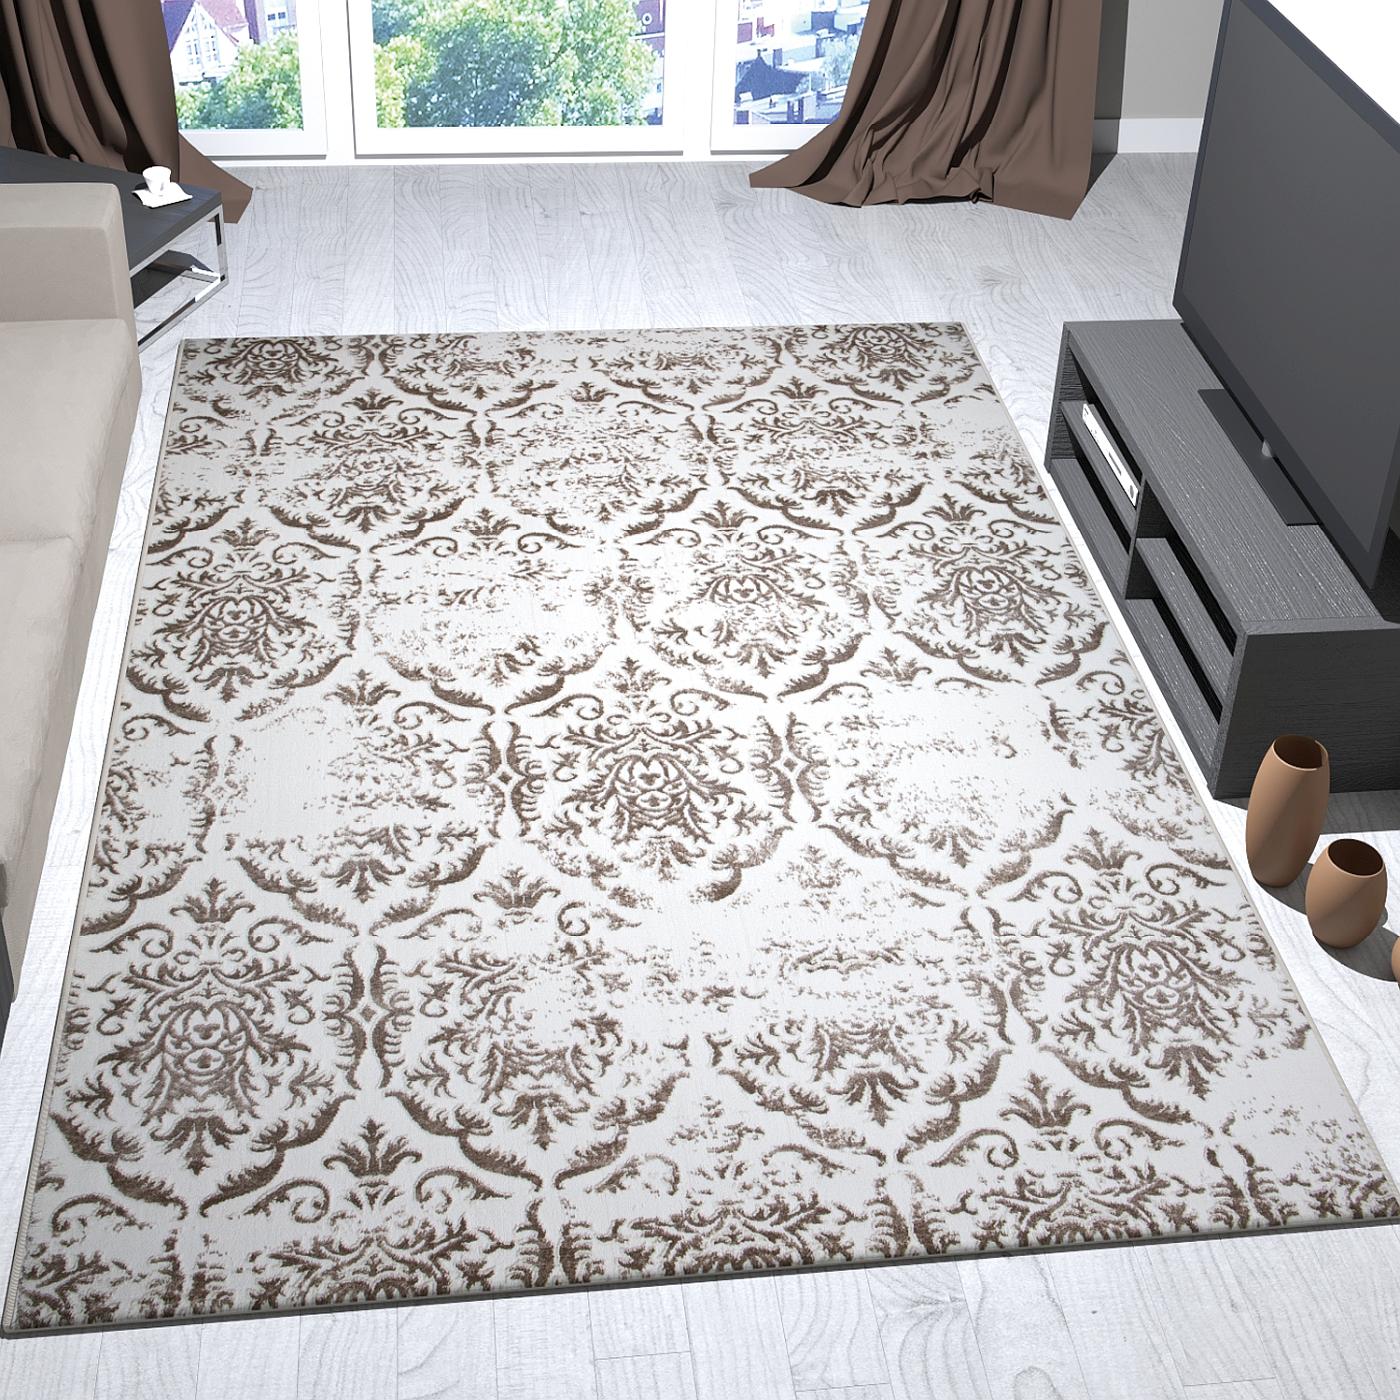 teppich design creme beige mit relief ornamenten getuftet. Black Bedroom Furniture Sets. Home Design Ideas